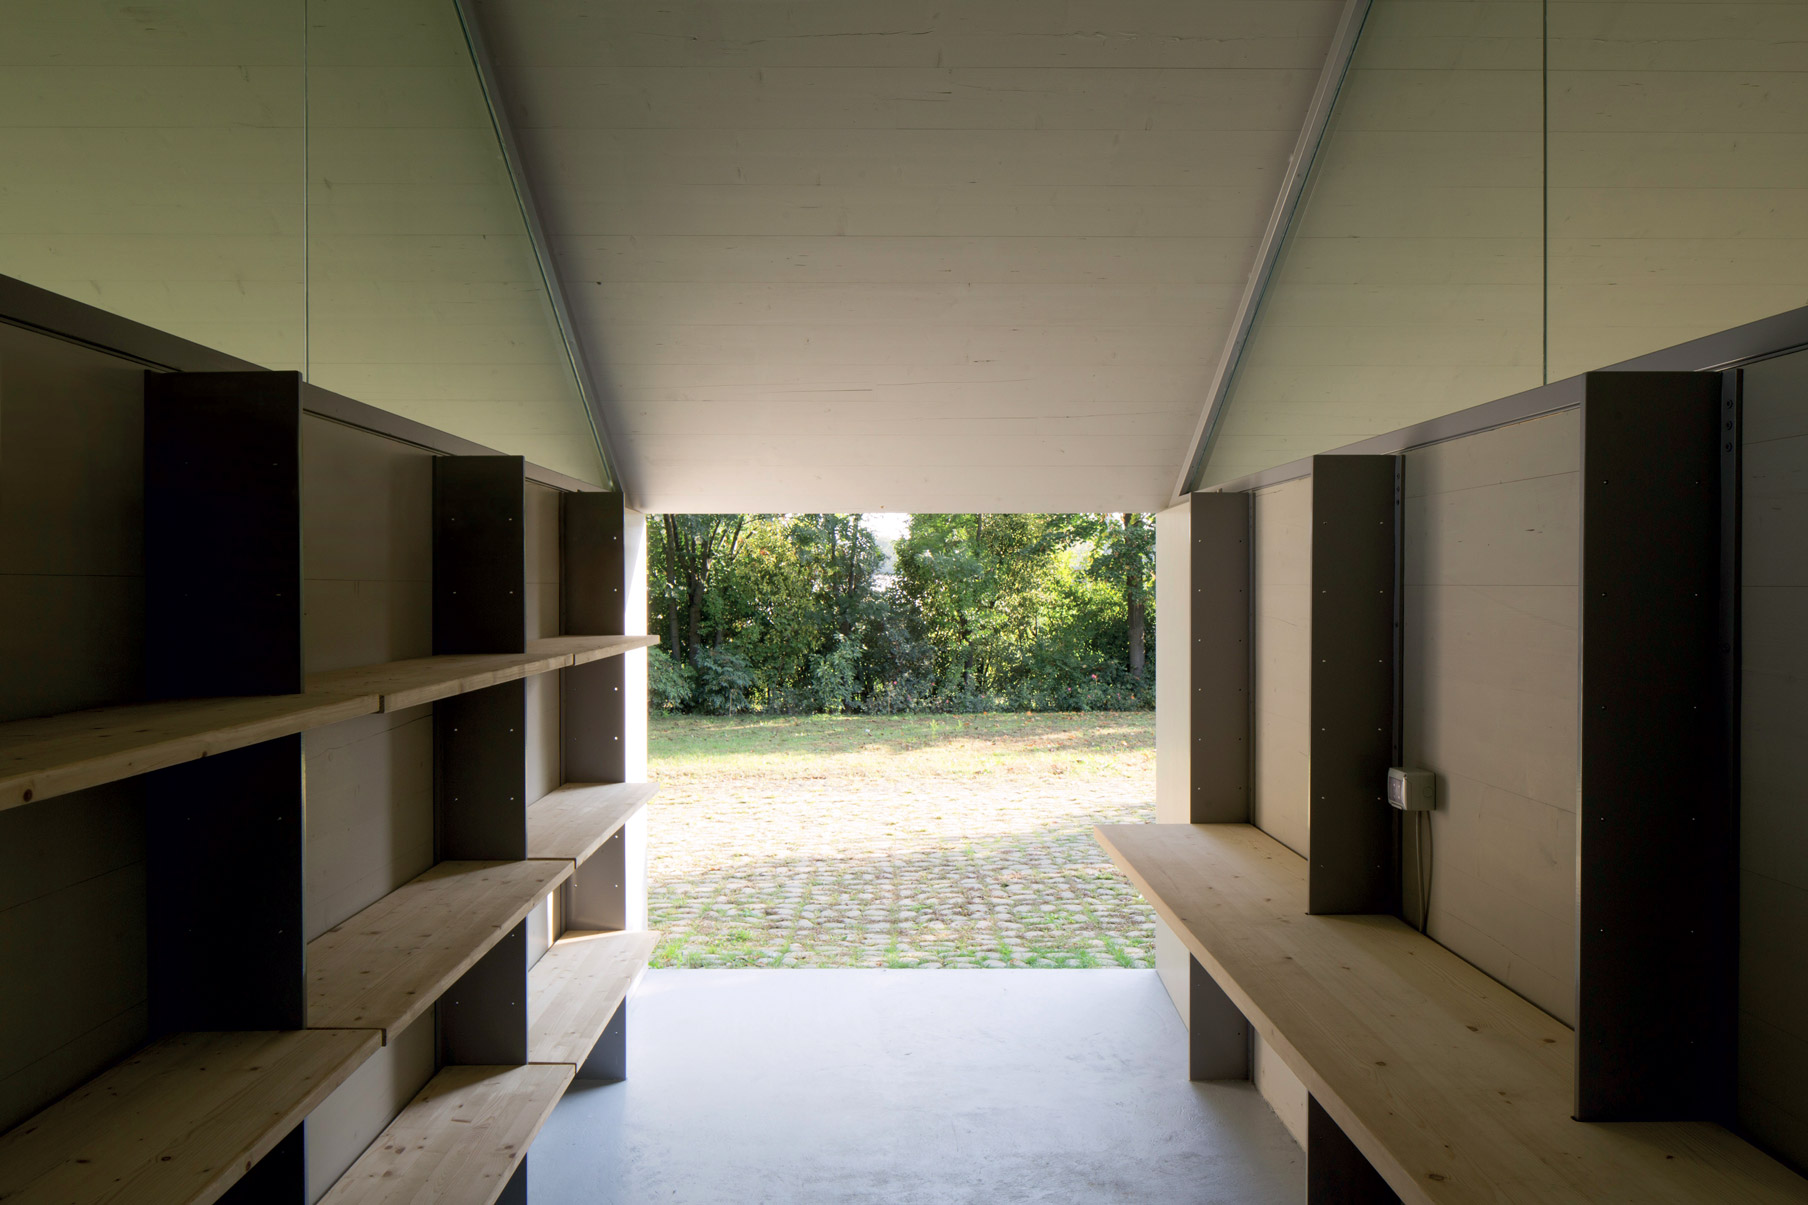 Interno Pensilina-Atelier nel parco